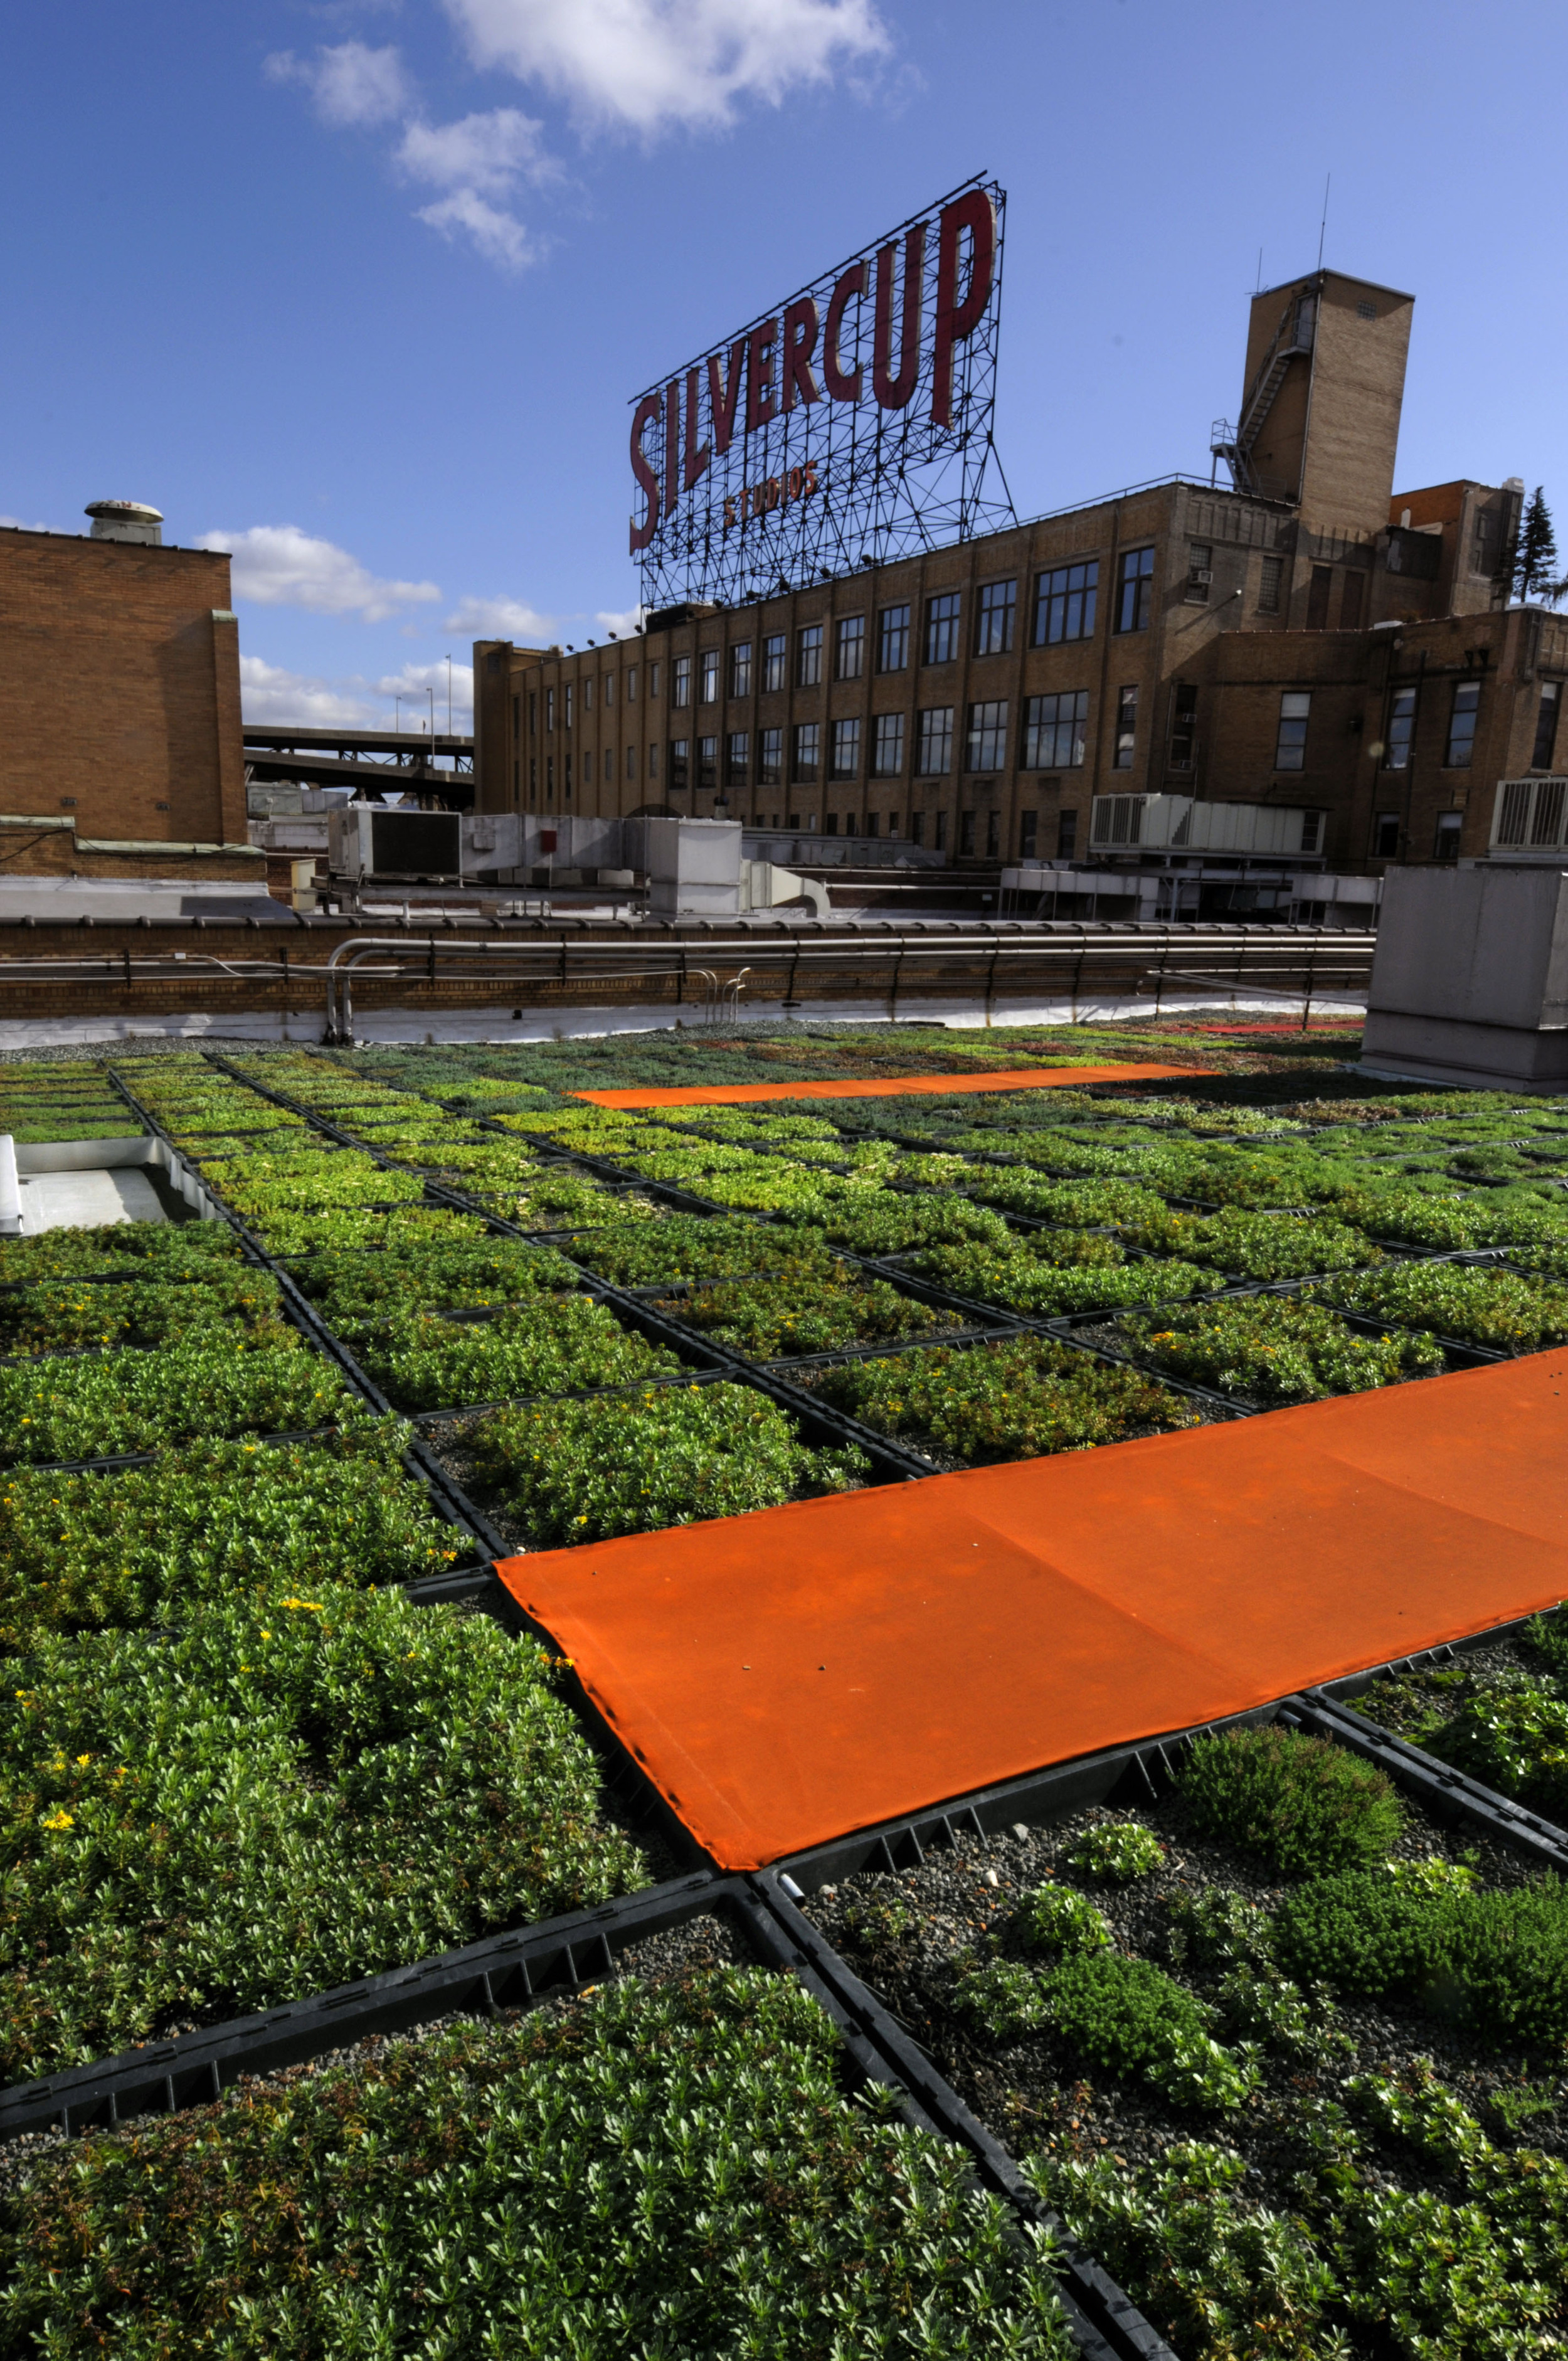 BA_LI Green City_Green Roof Planting_Mark Dye.jpg